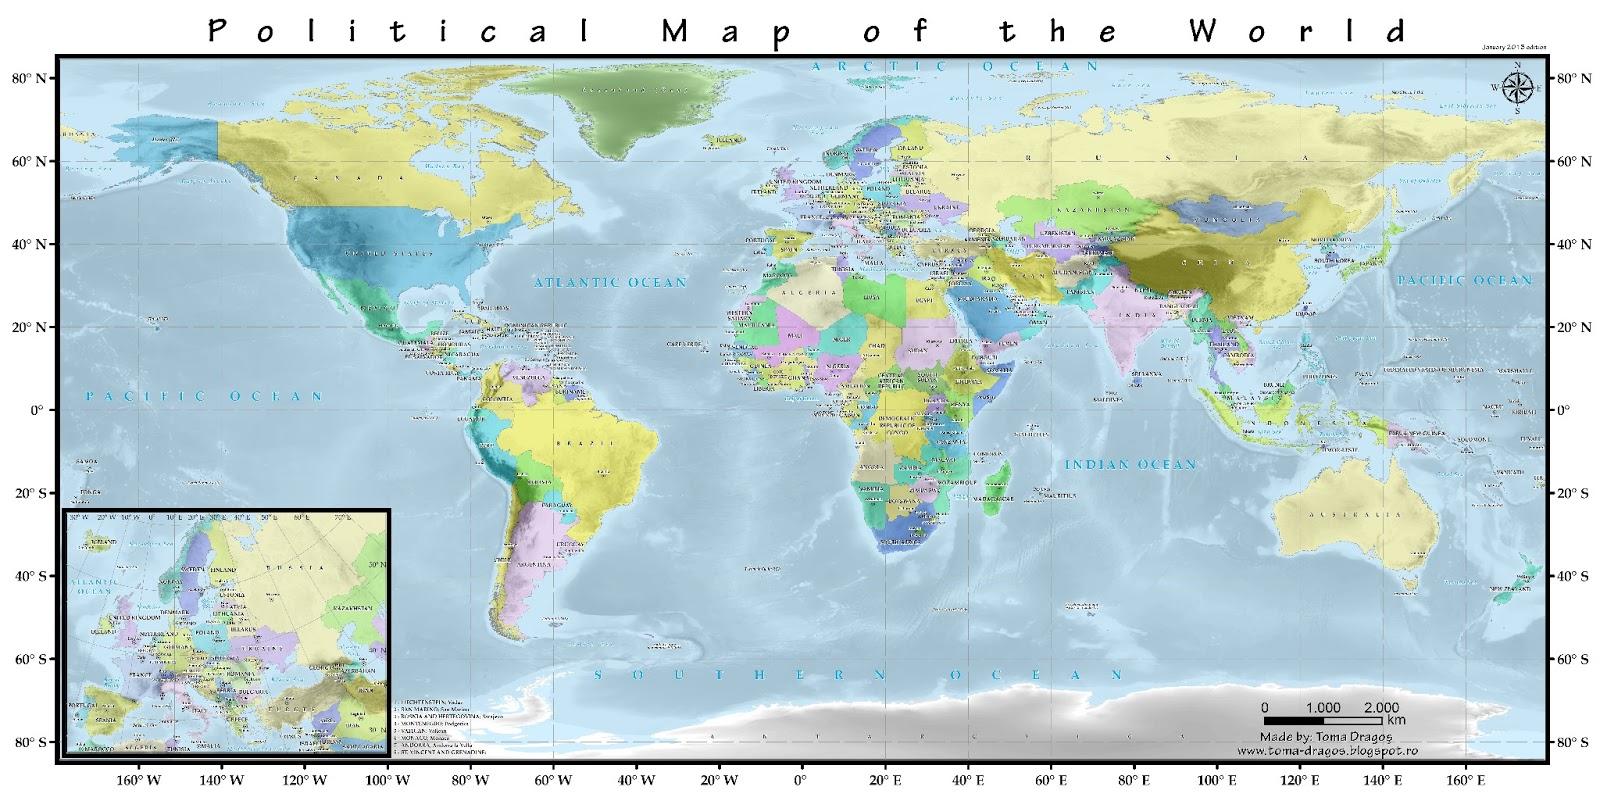 Lumea geografic i muzical a lui Drago Political map of the world and of